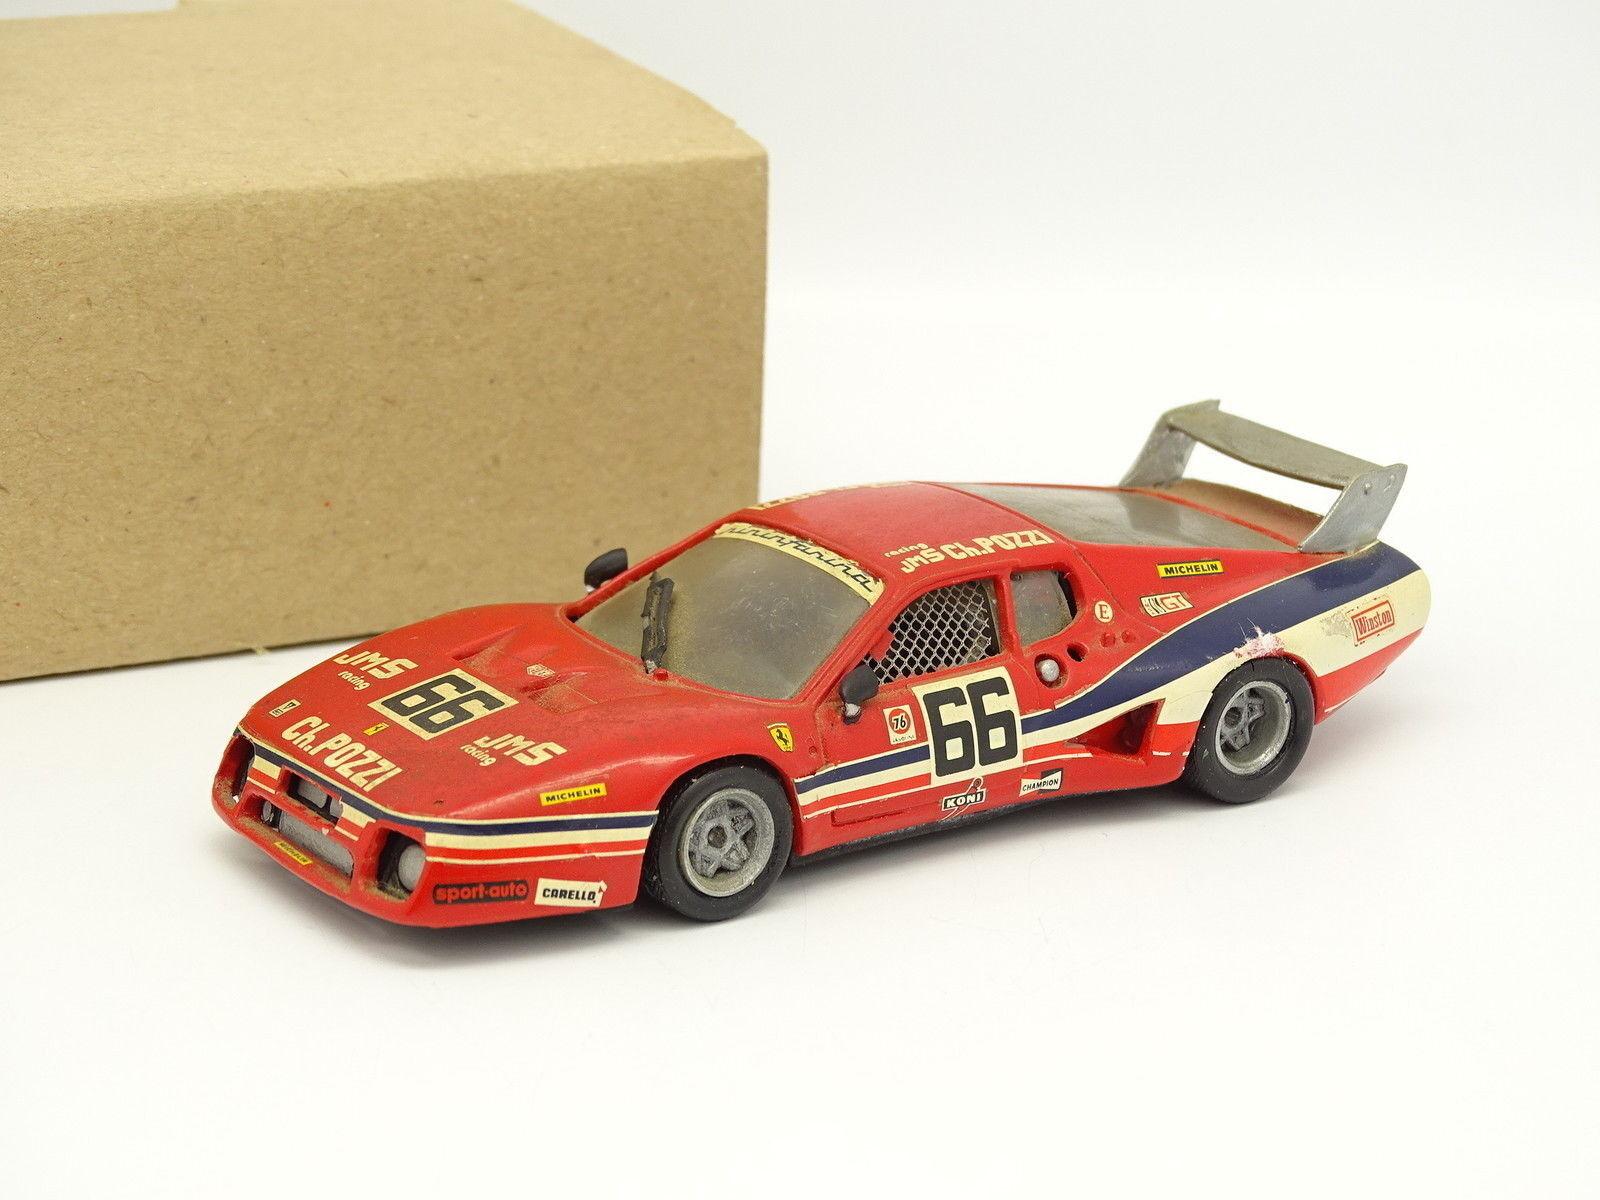 AMR Kit Montado Metal 1 43 - Ferrari 512 BB Pozzi Le Mans 1980 N° 66